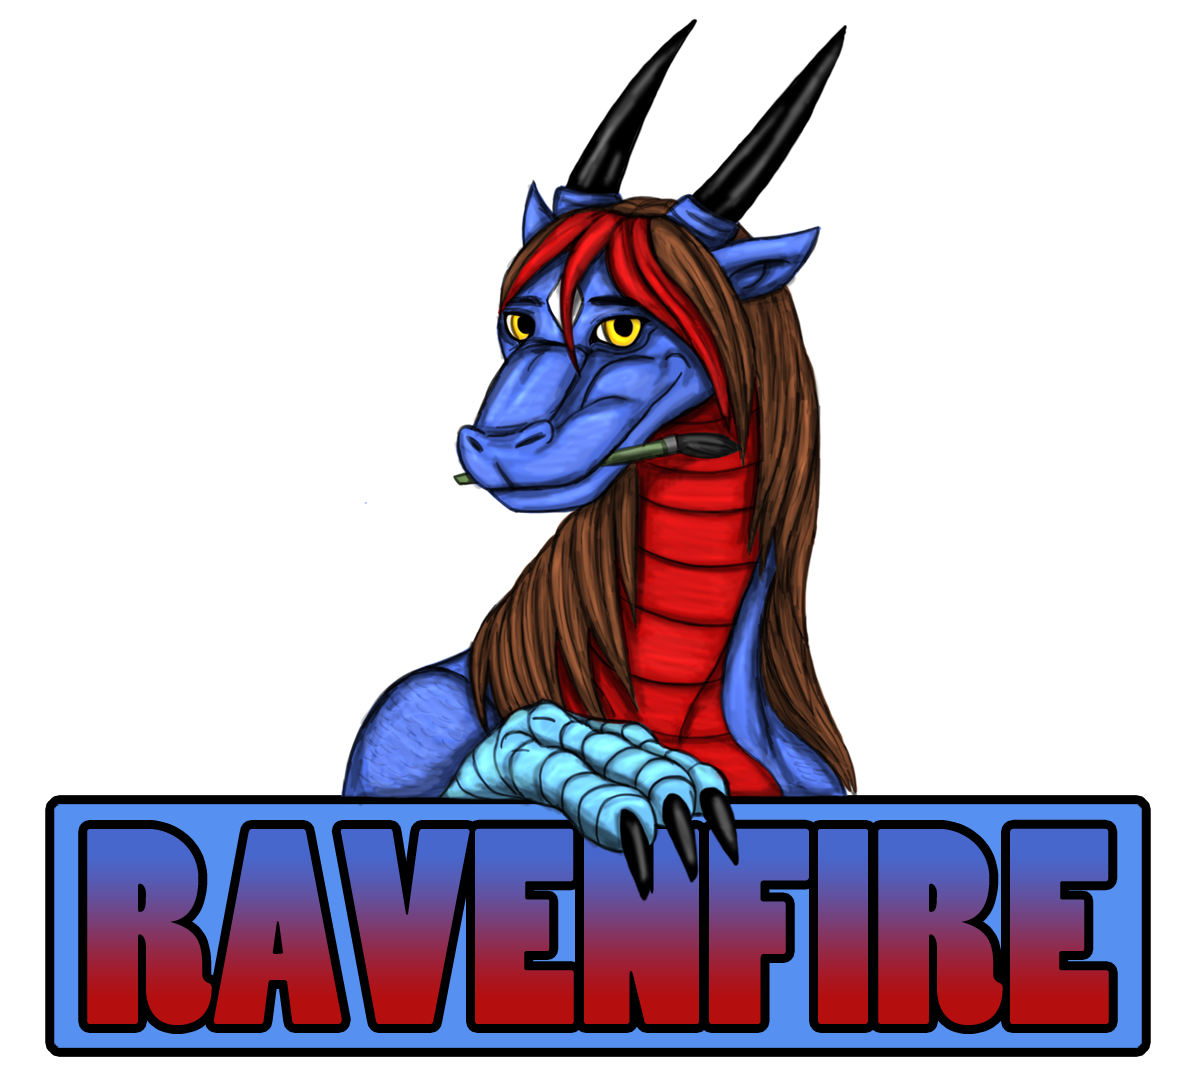 Ravenfire5's Profile Picture